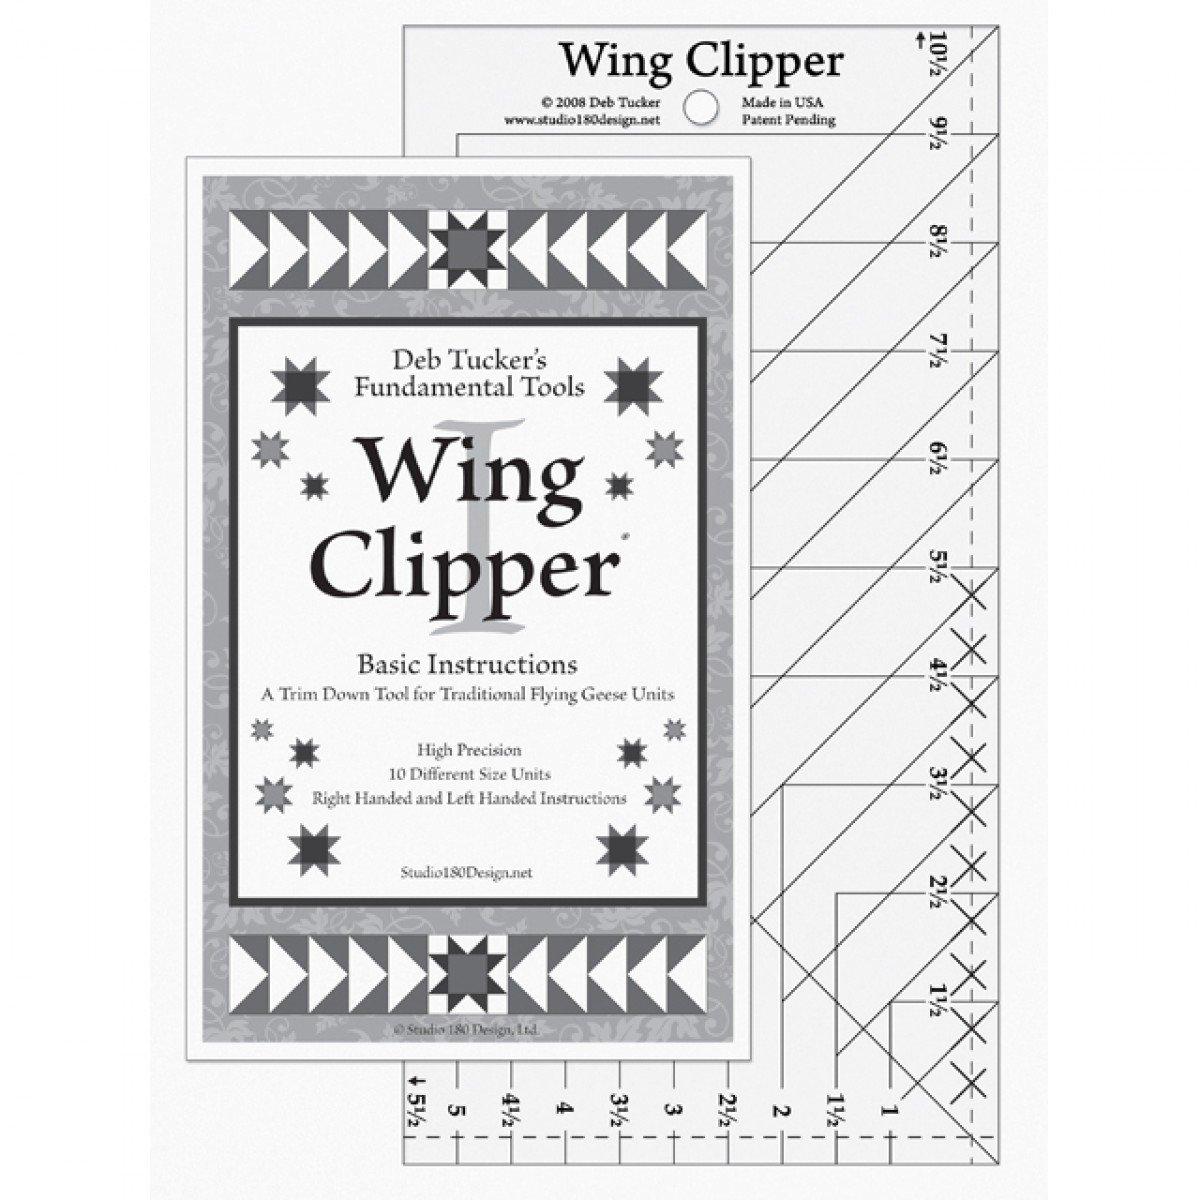 Deb Tucker's Wing Clipper